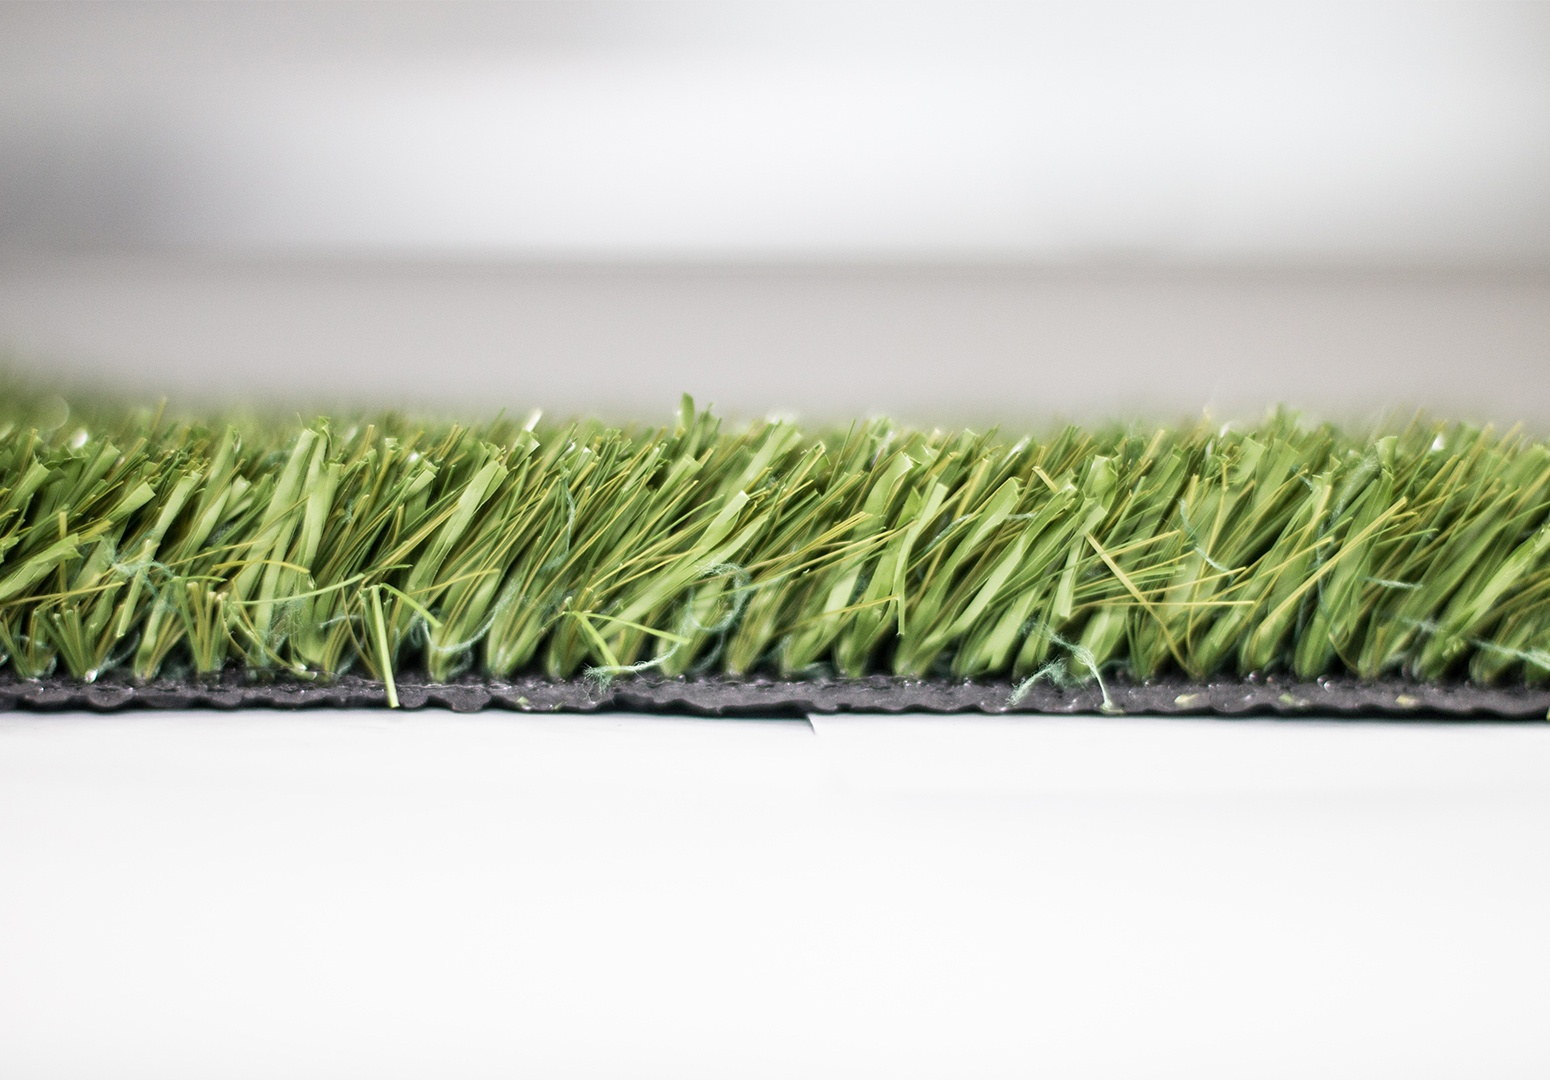 Fake Grass for Dogs - Pedigree